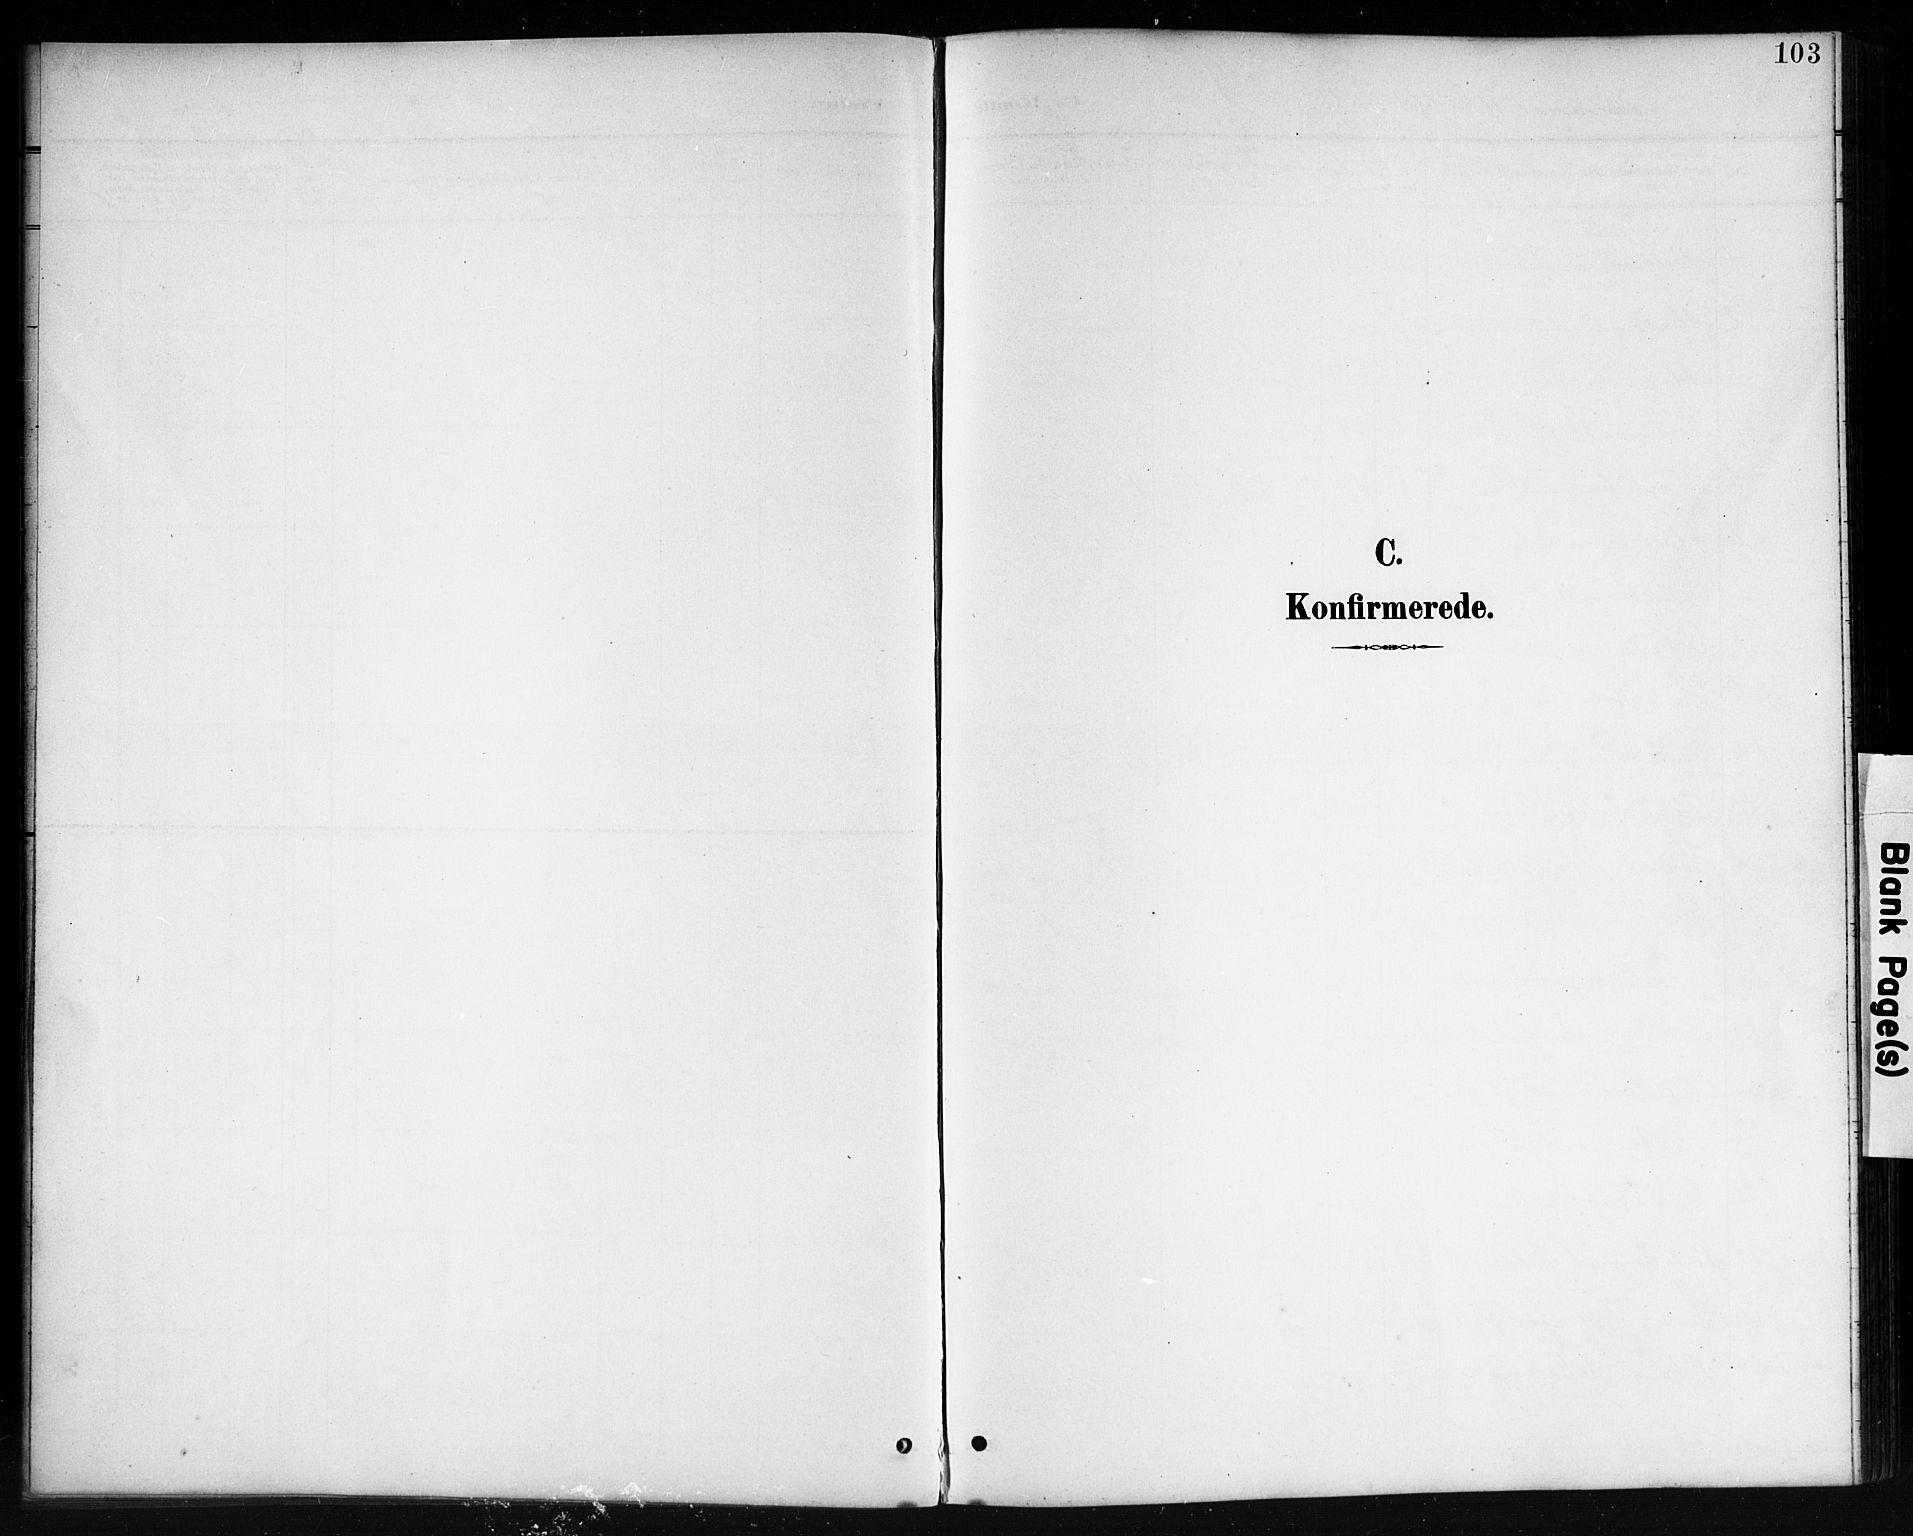 SAK, Lyngdal sokneprestkontor, F/Fb/Fbc/L0005: Klokkerbok nr. B 5, 1897-1913, s. 103